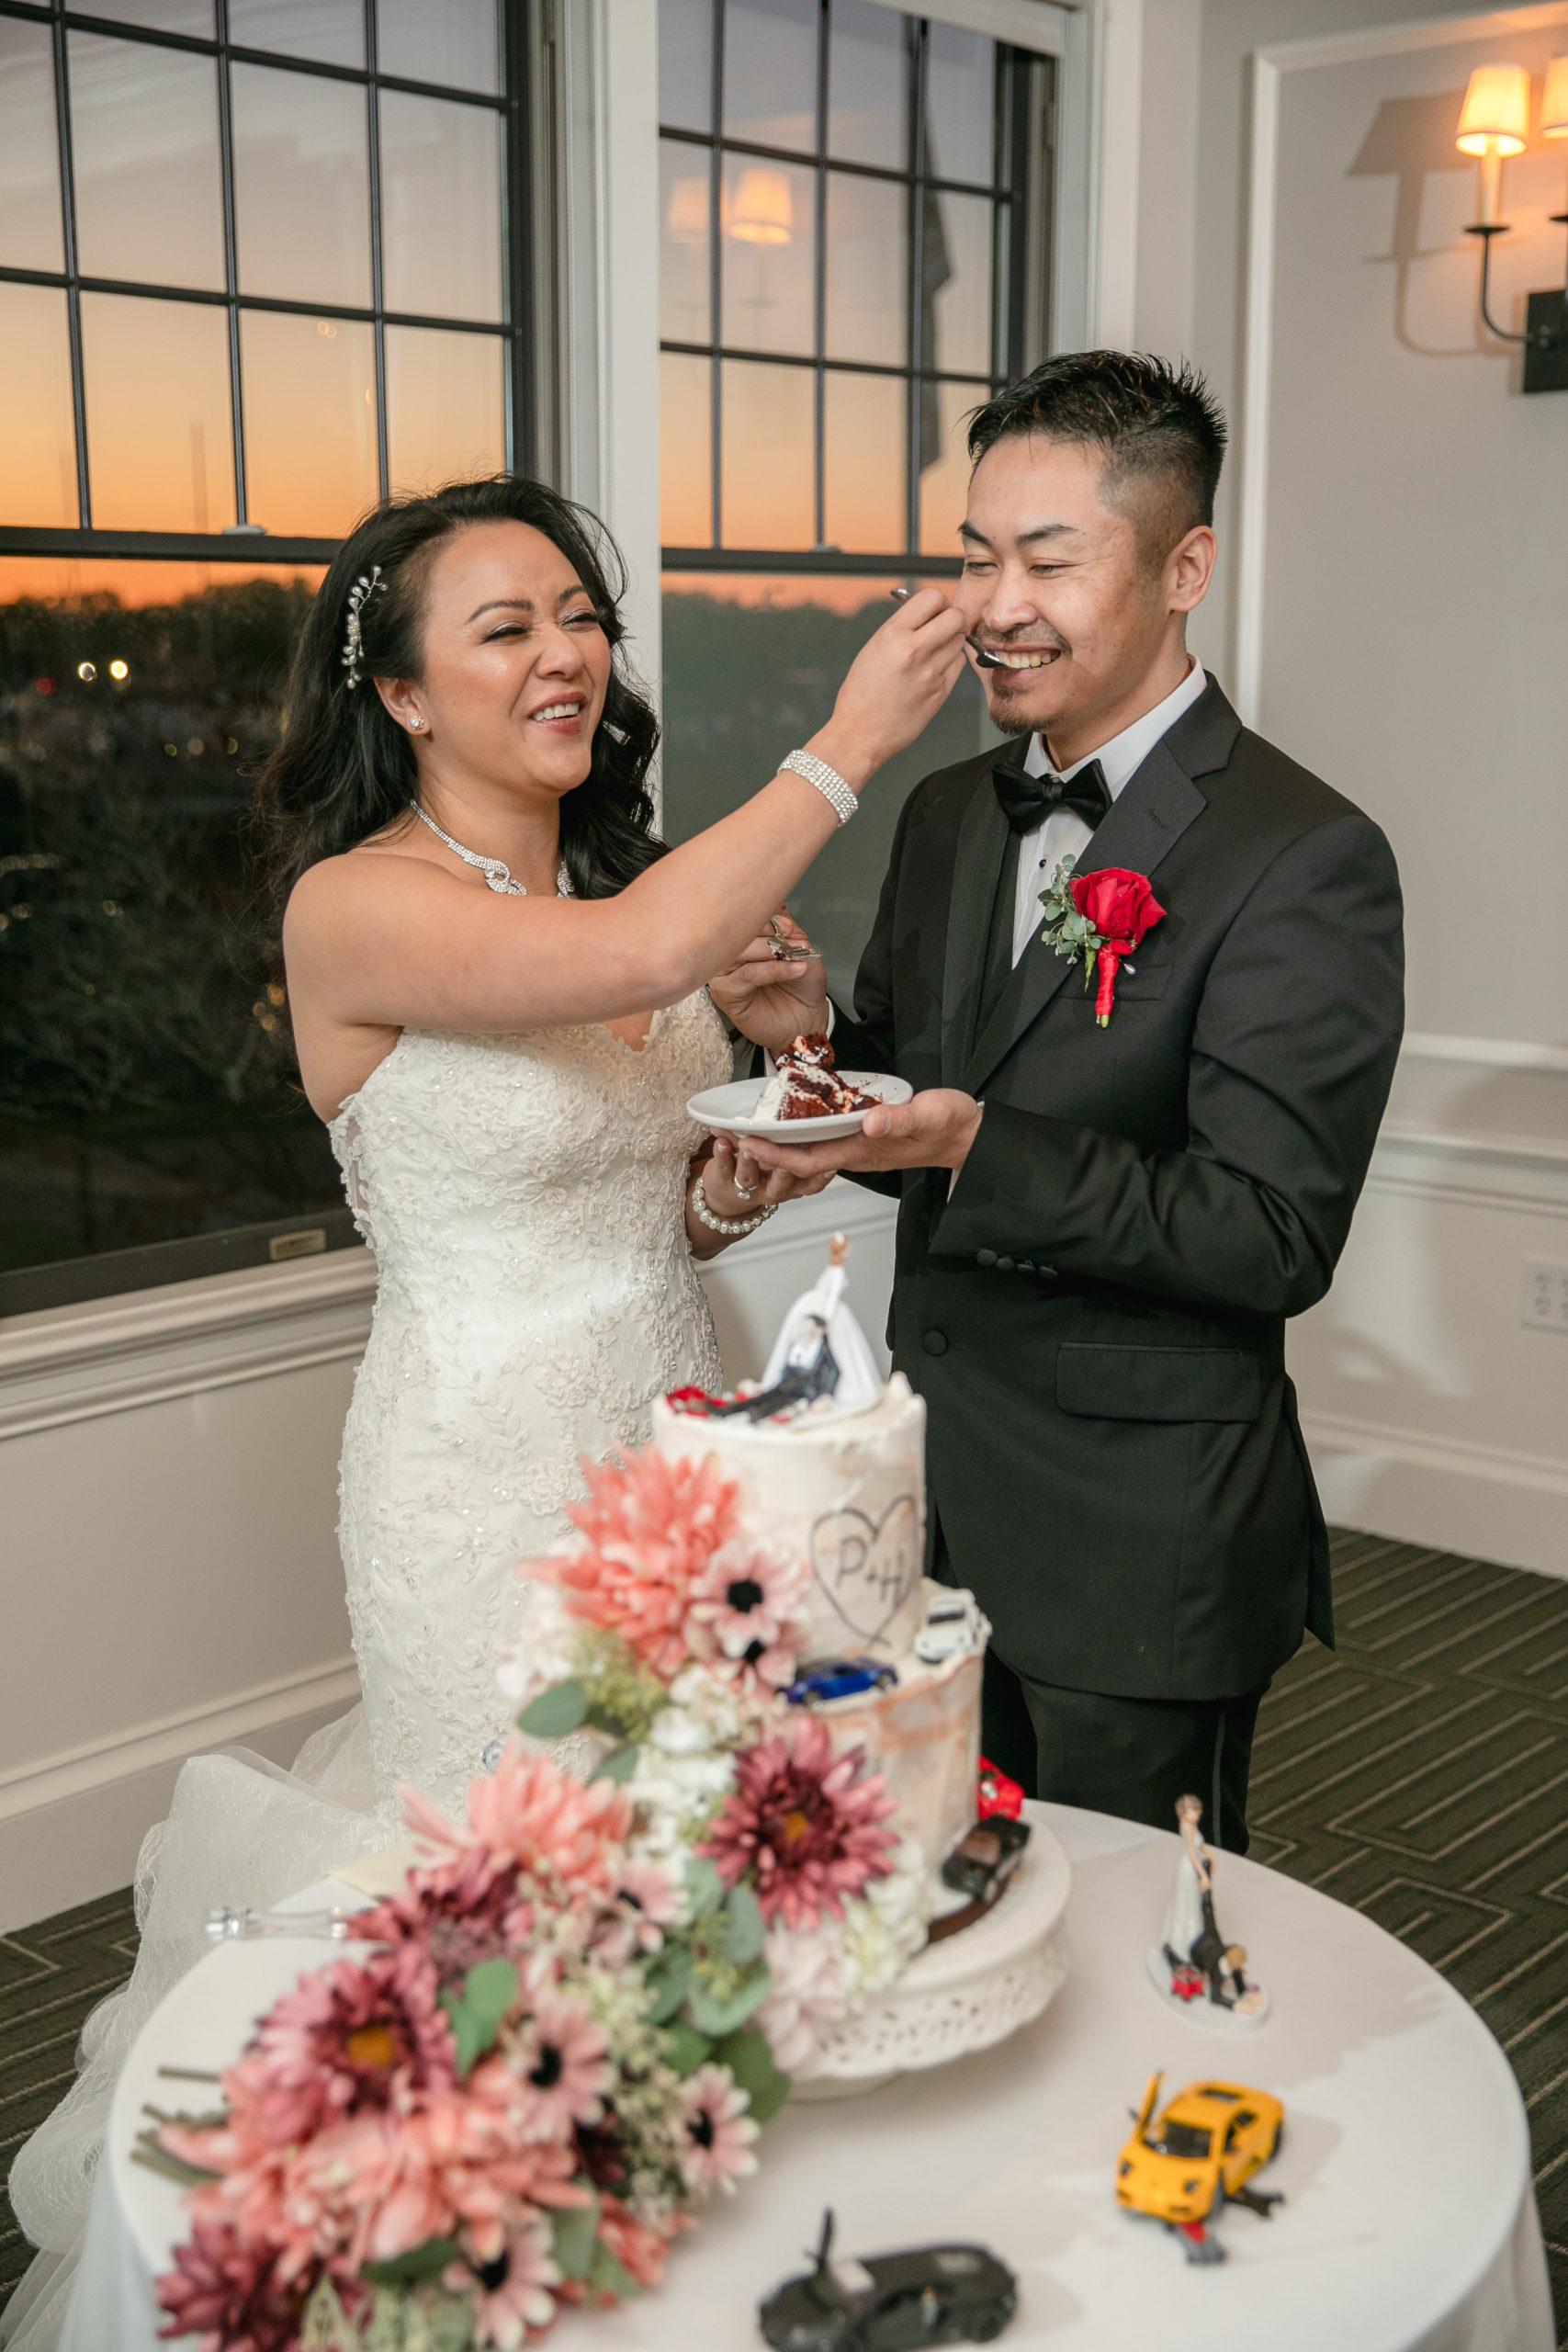 Harbor lights, warwick, rhode island, RI, Tracy Jenkins Photography, RI wedding photographer, Rhode Island wedding photographer, micro-wedding, reception, cake-cutting